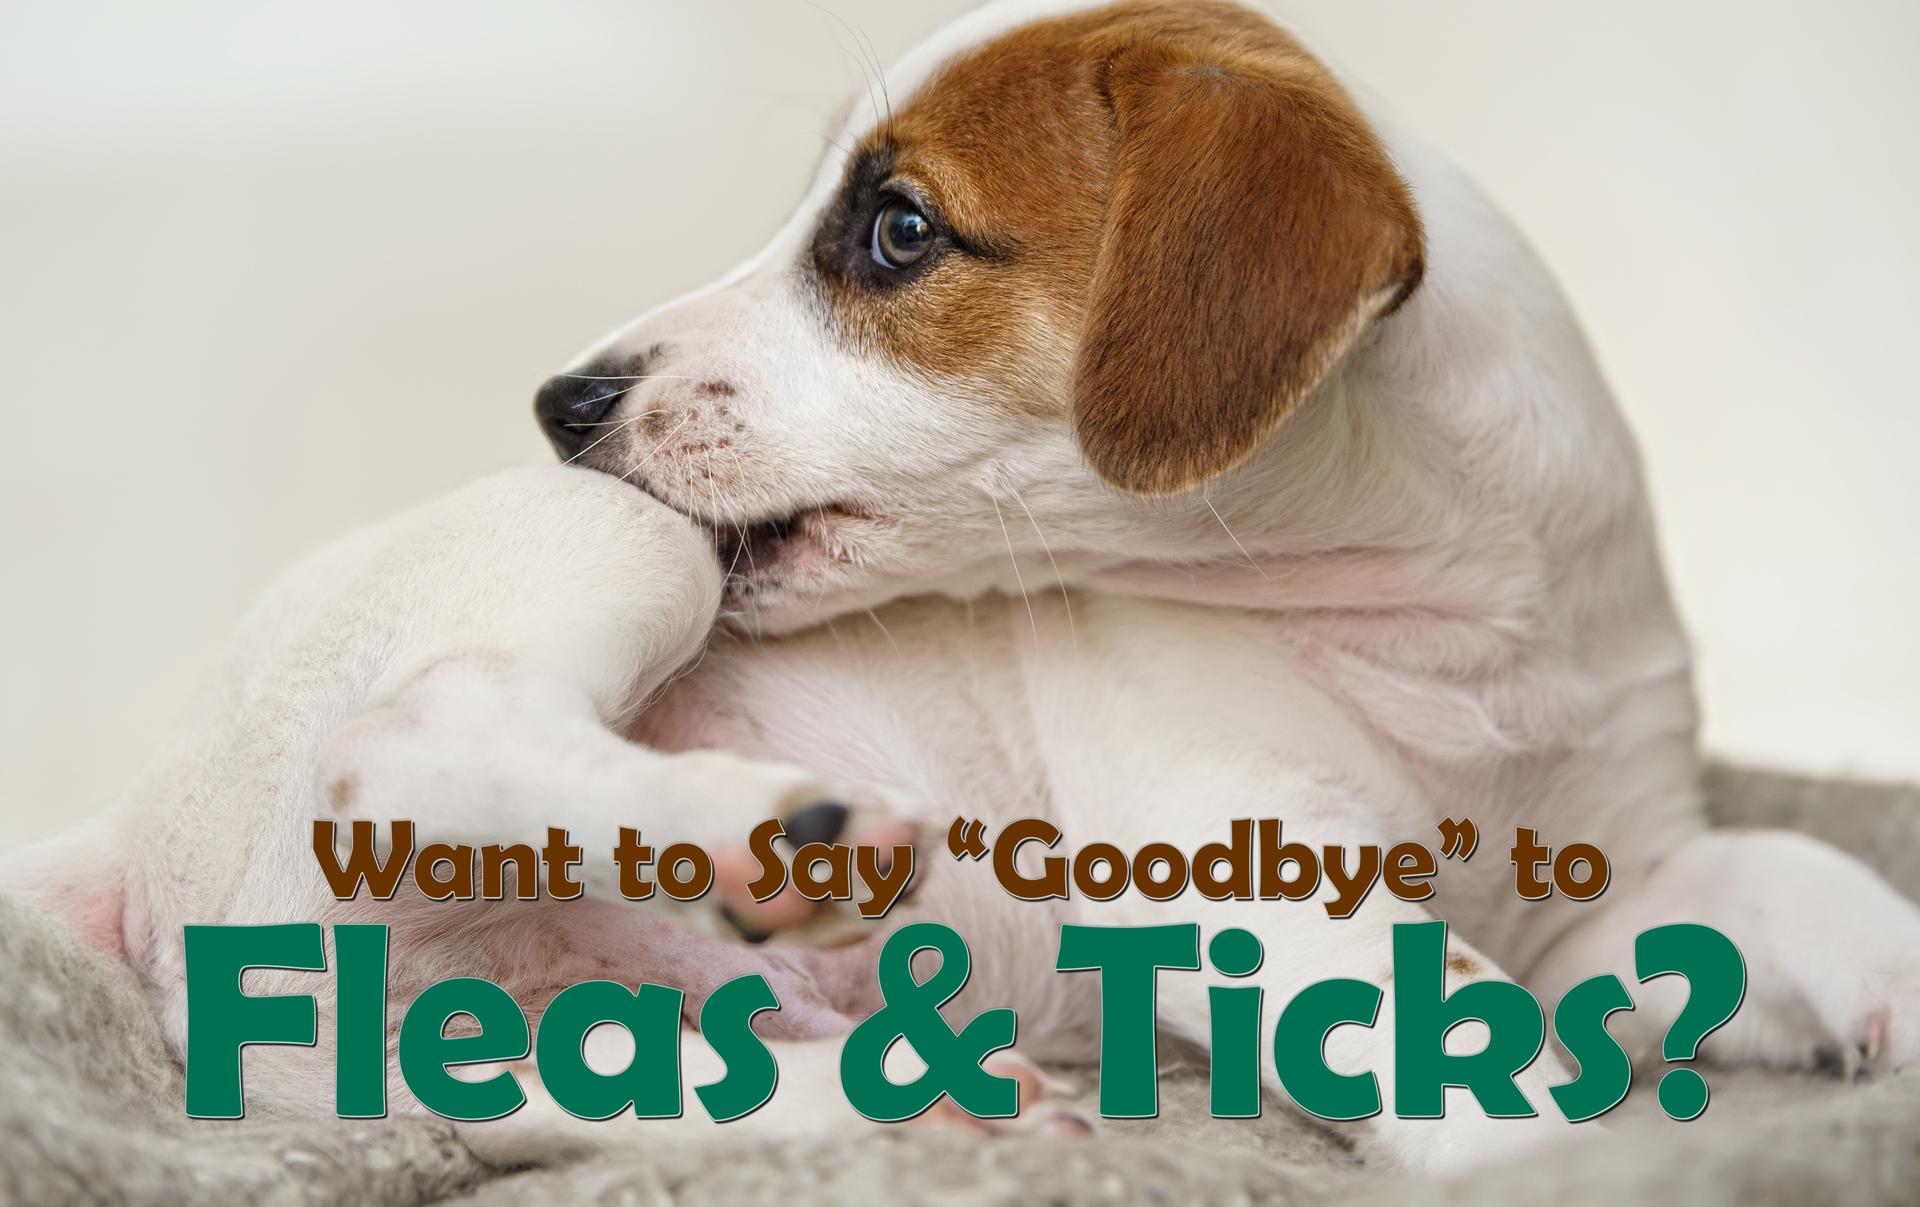 say-goodbye-to-fleas-ticks-hdr